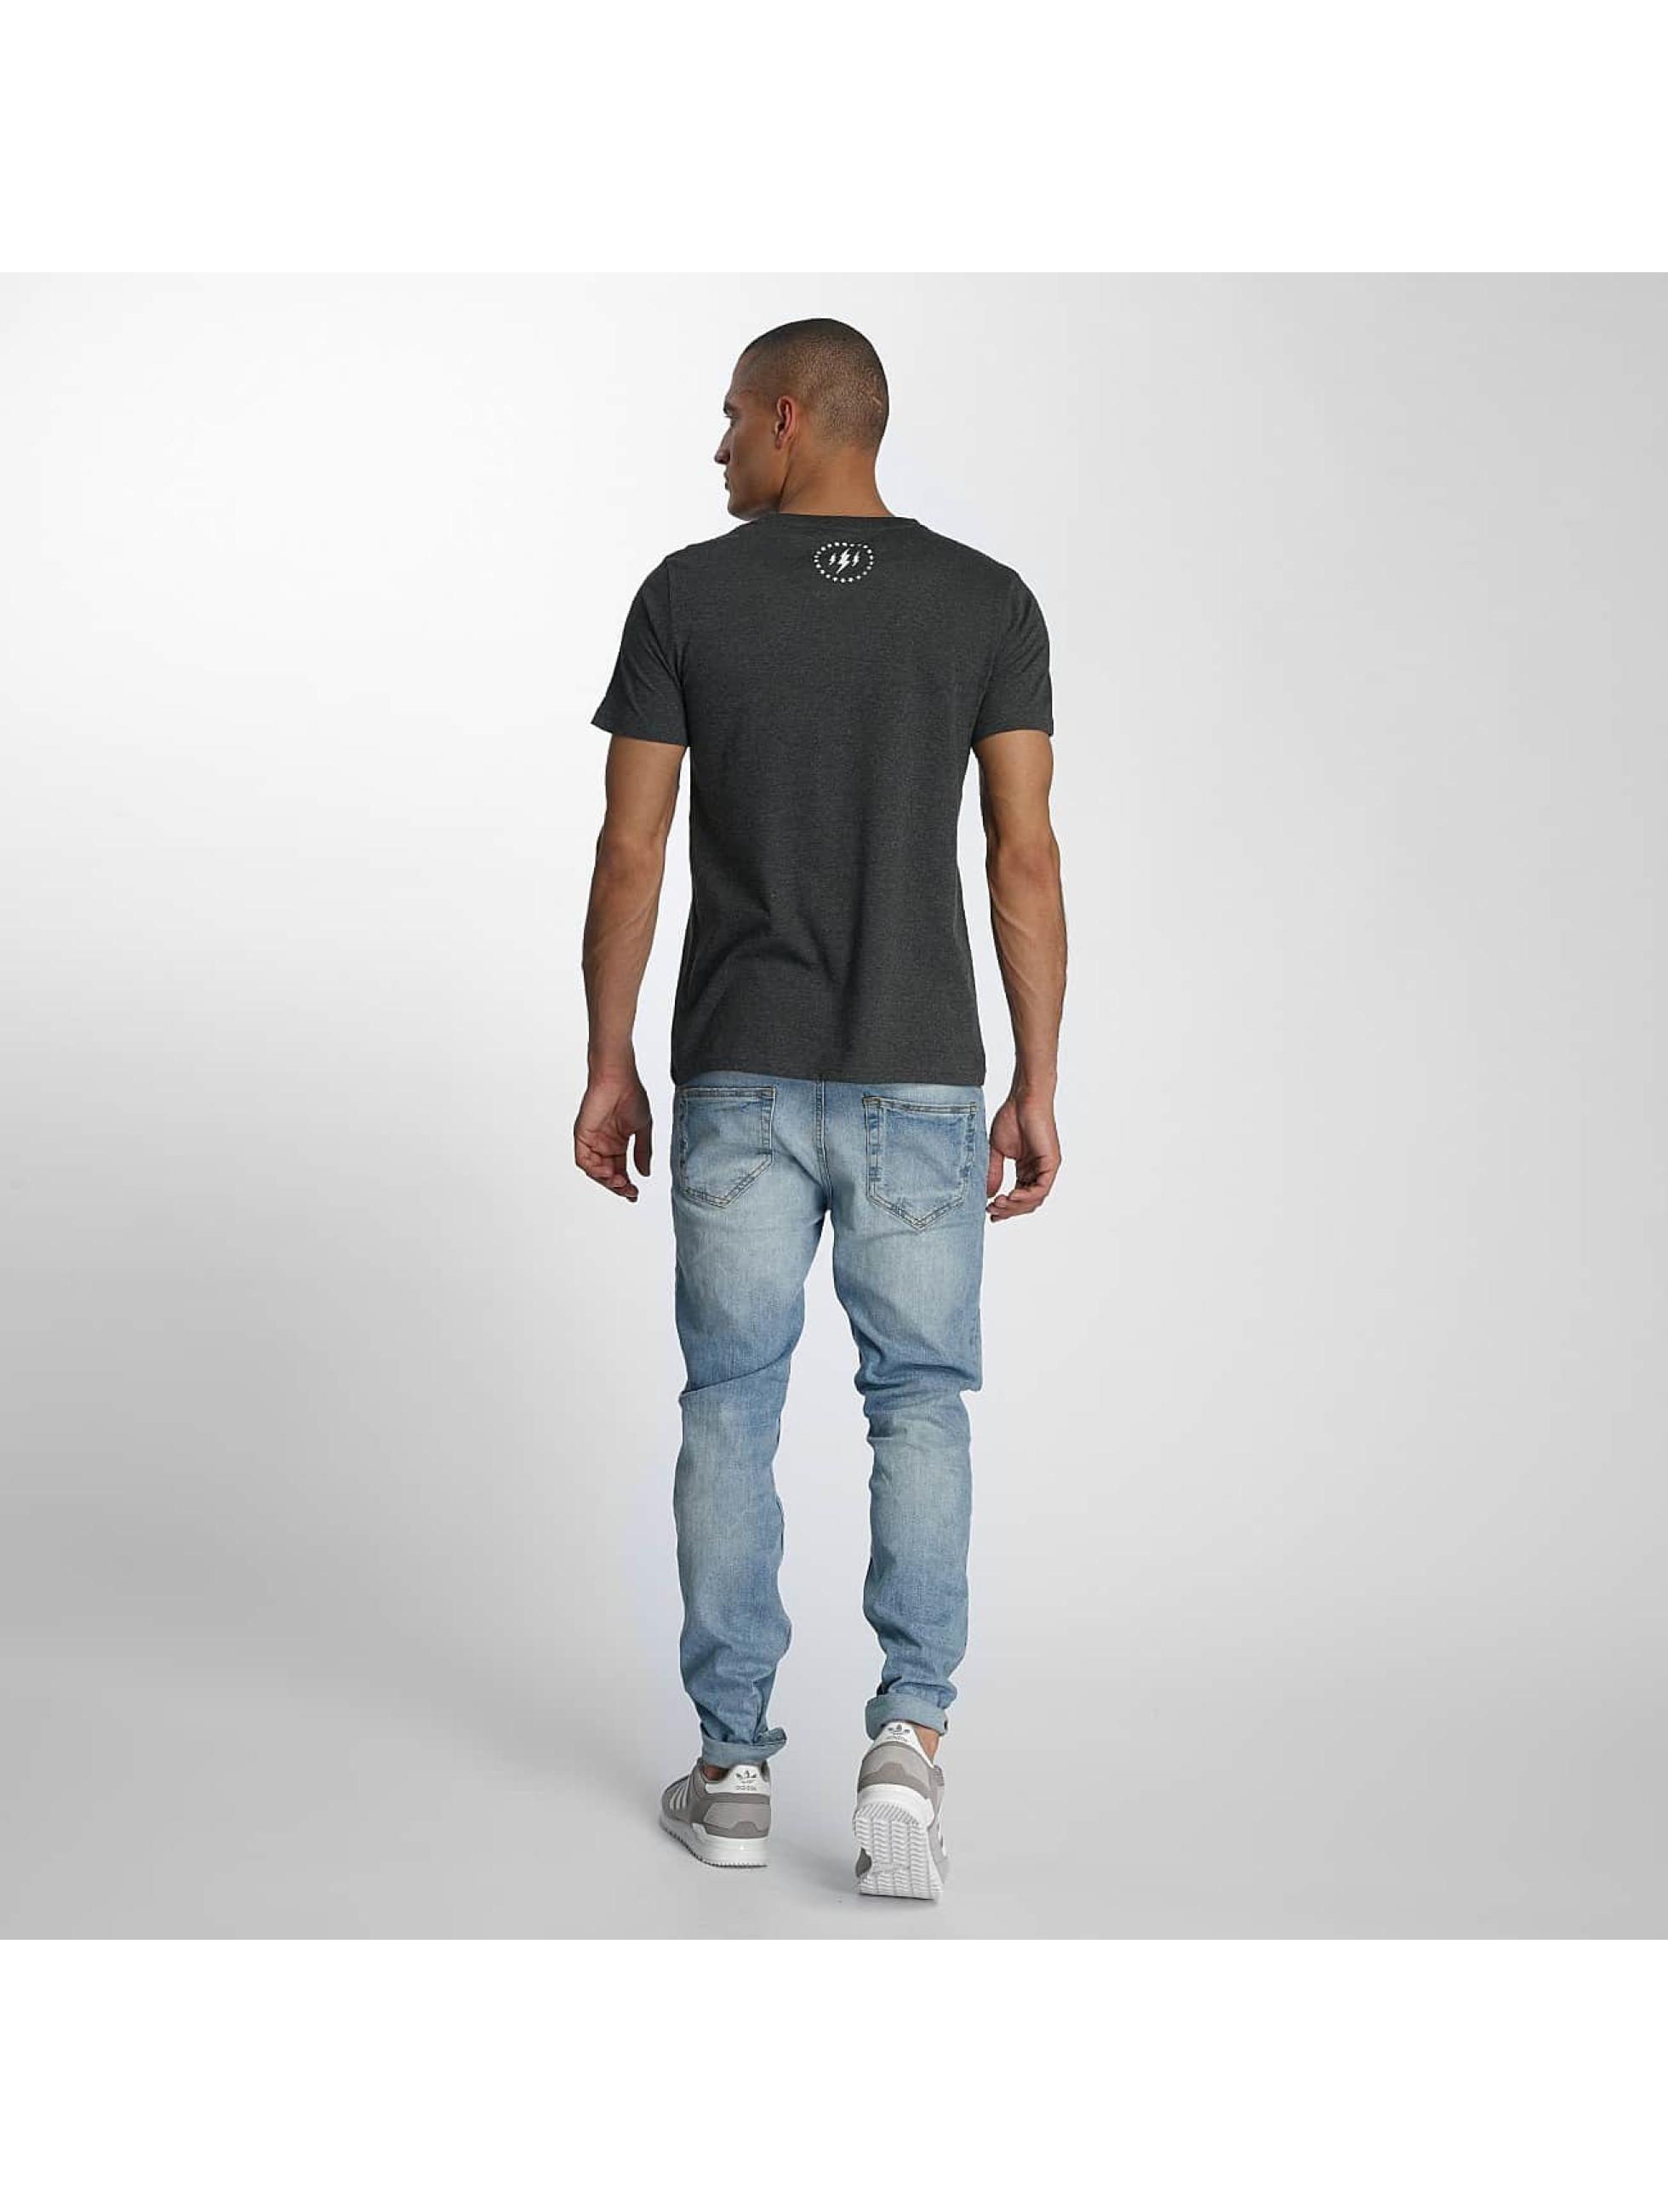 TrueSpin t-shirt 8 grijs